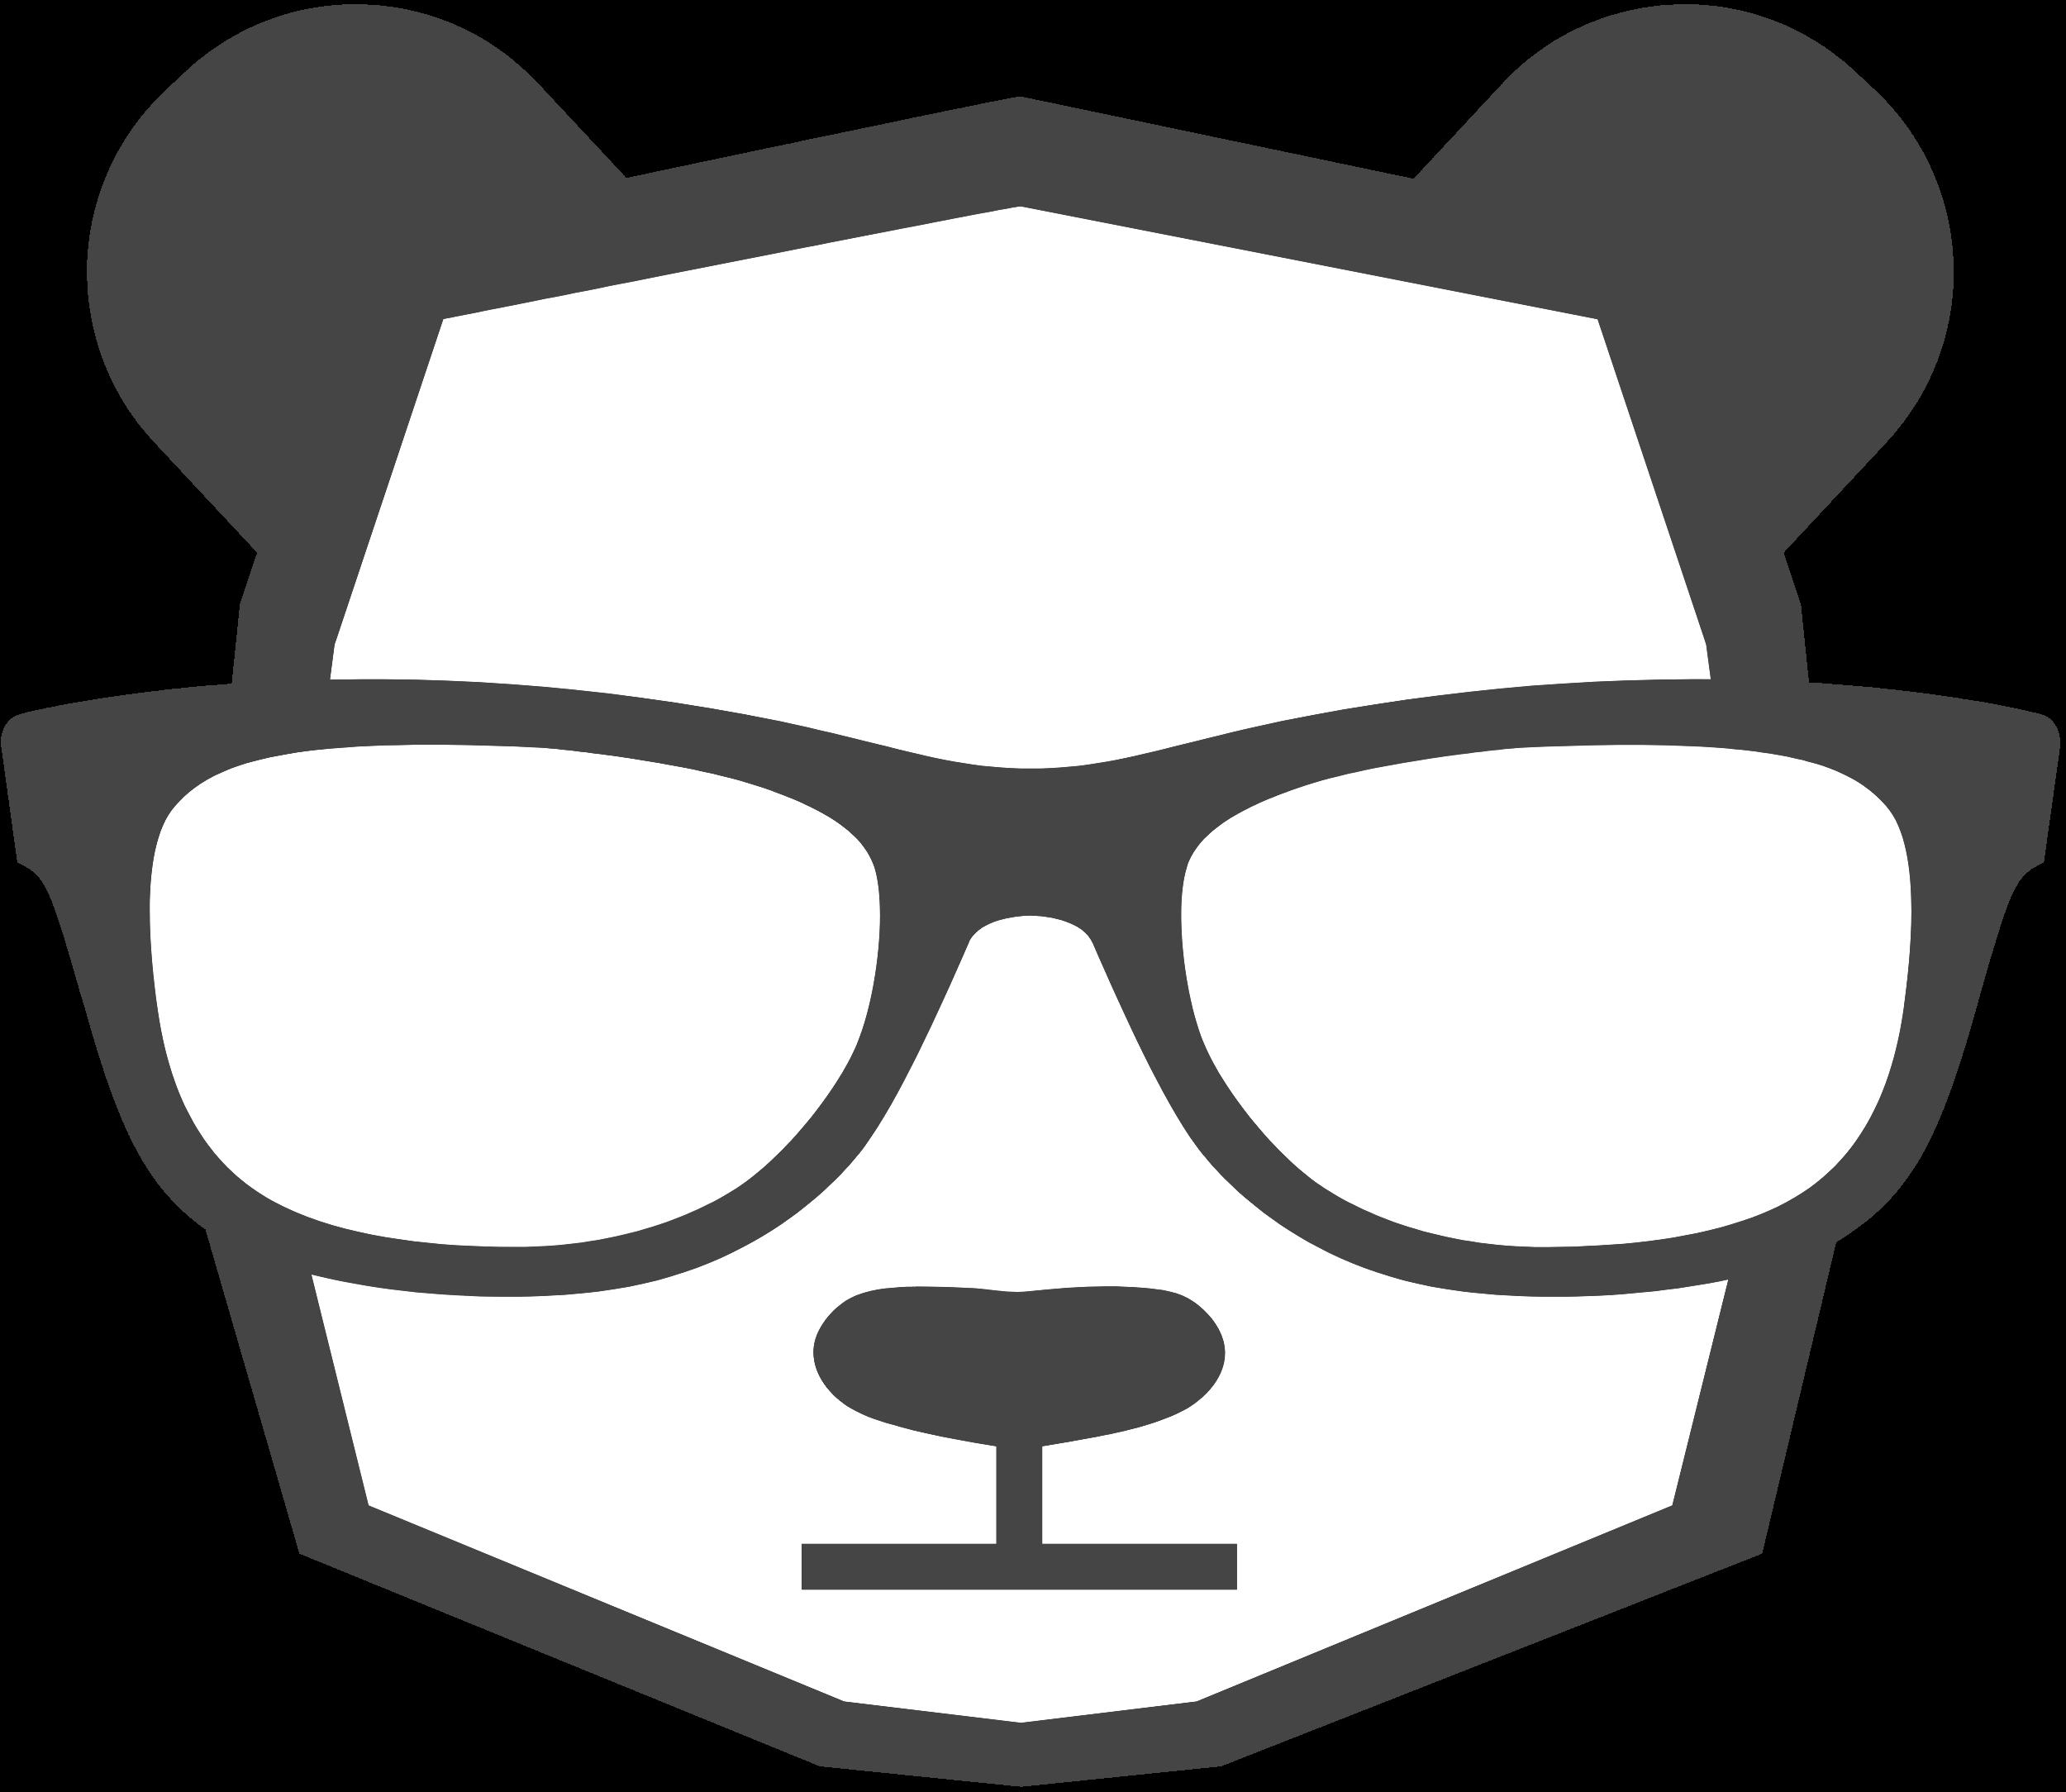 Big Panda -logo